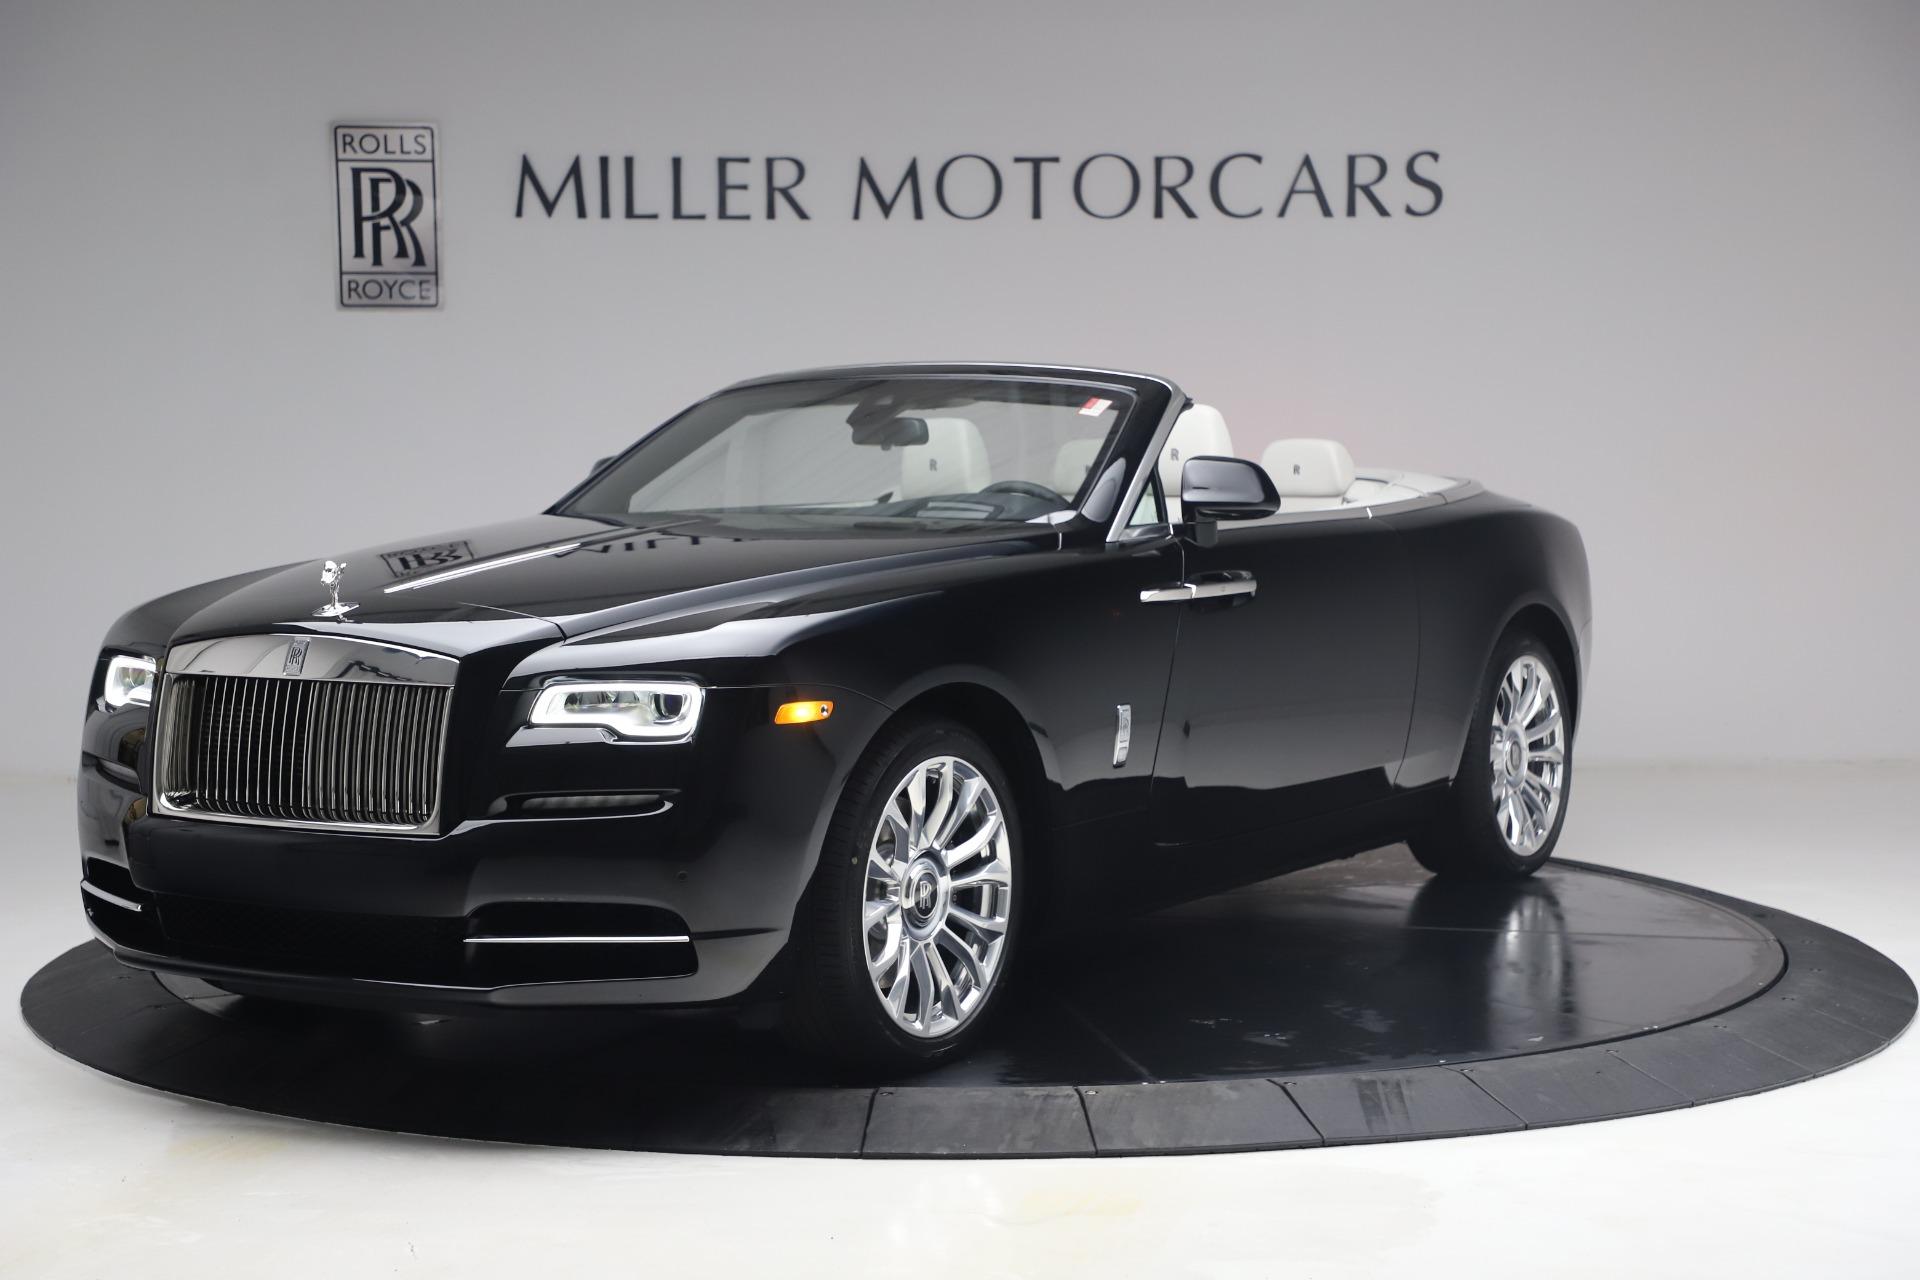 New 2021 Rolls-Royce Dawn for sale Sold at Bugatti of Greenwich in Greenwich CT 06830 1